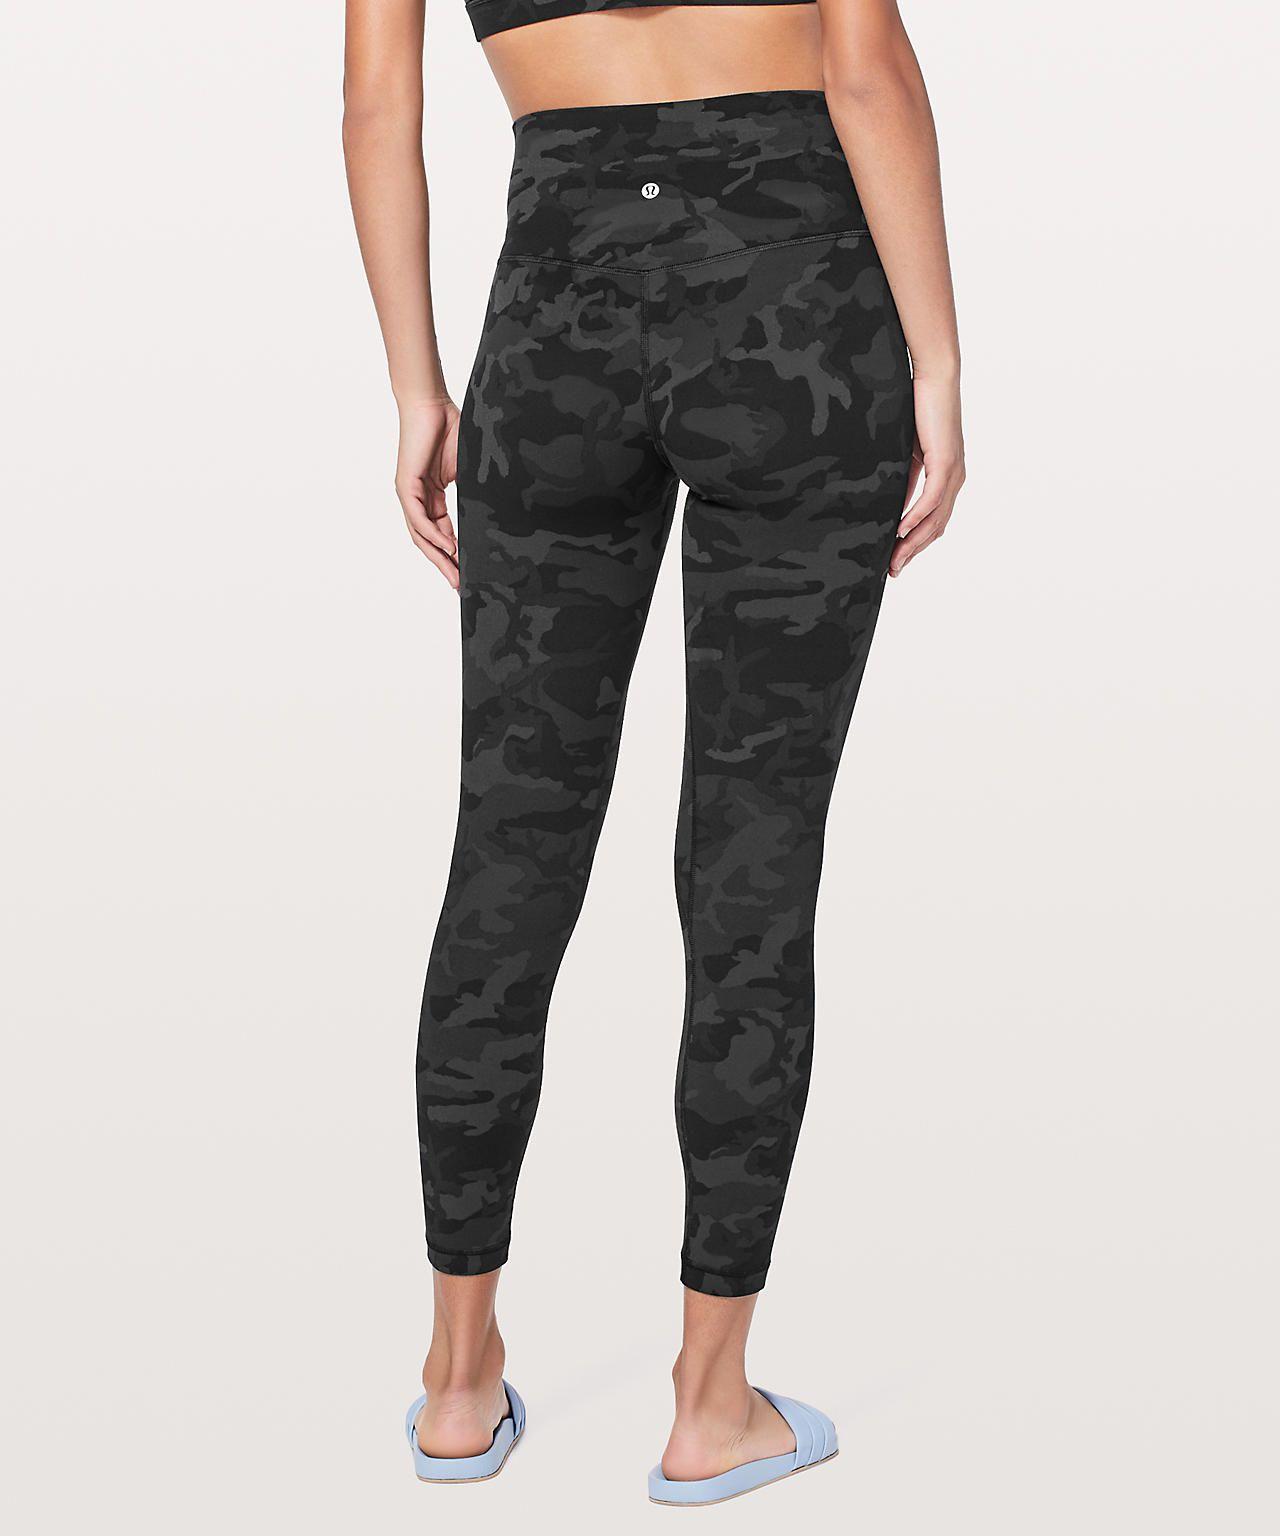 038a97dafe Lululemon Align Pant II 25 | Wish List | Camo workout clothes, Pants ...